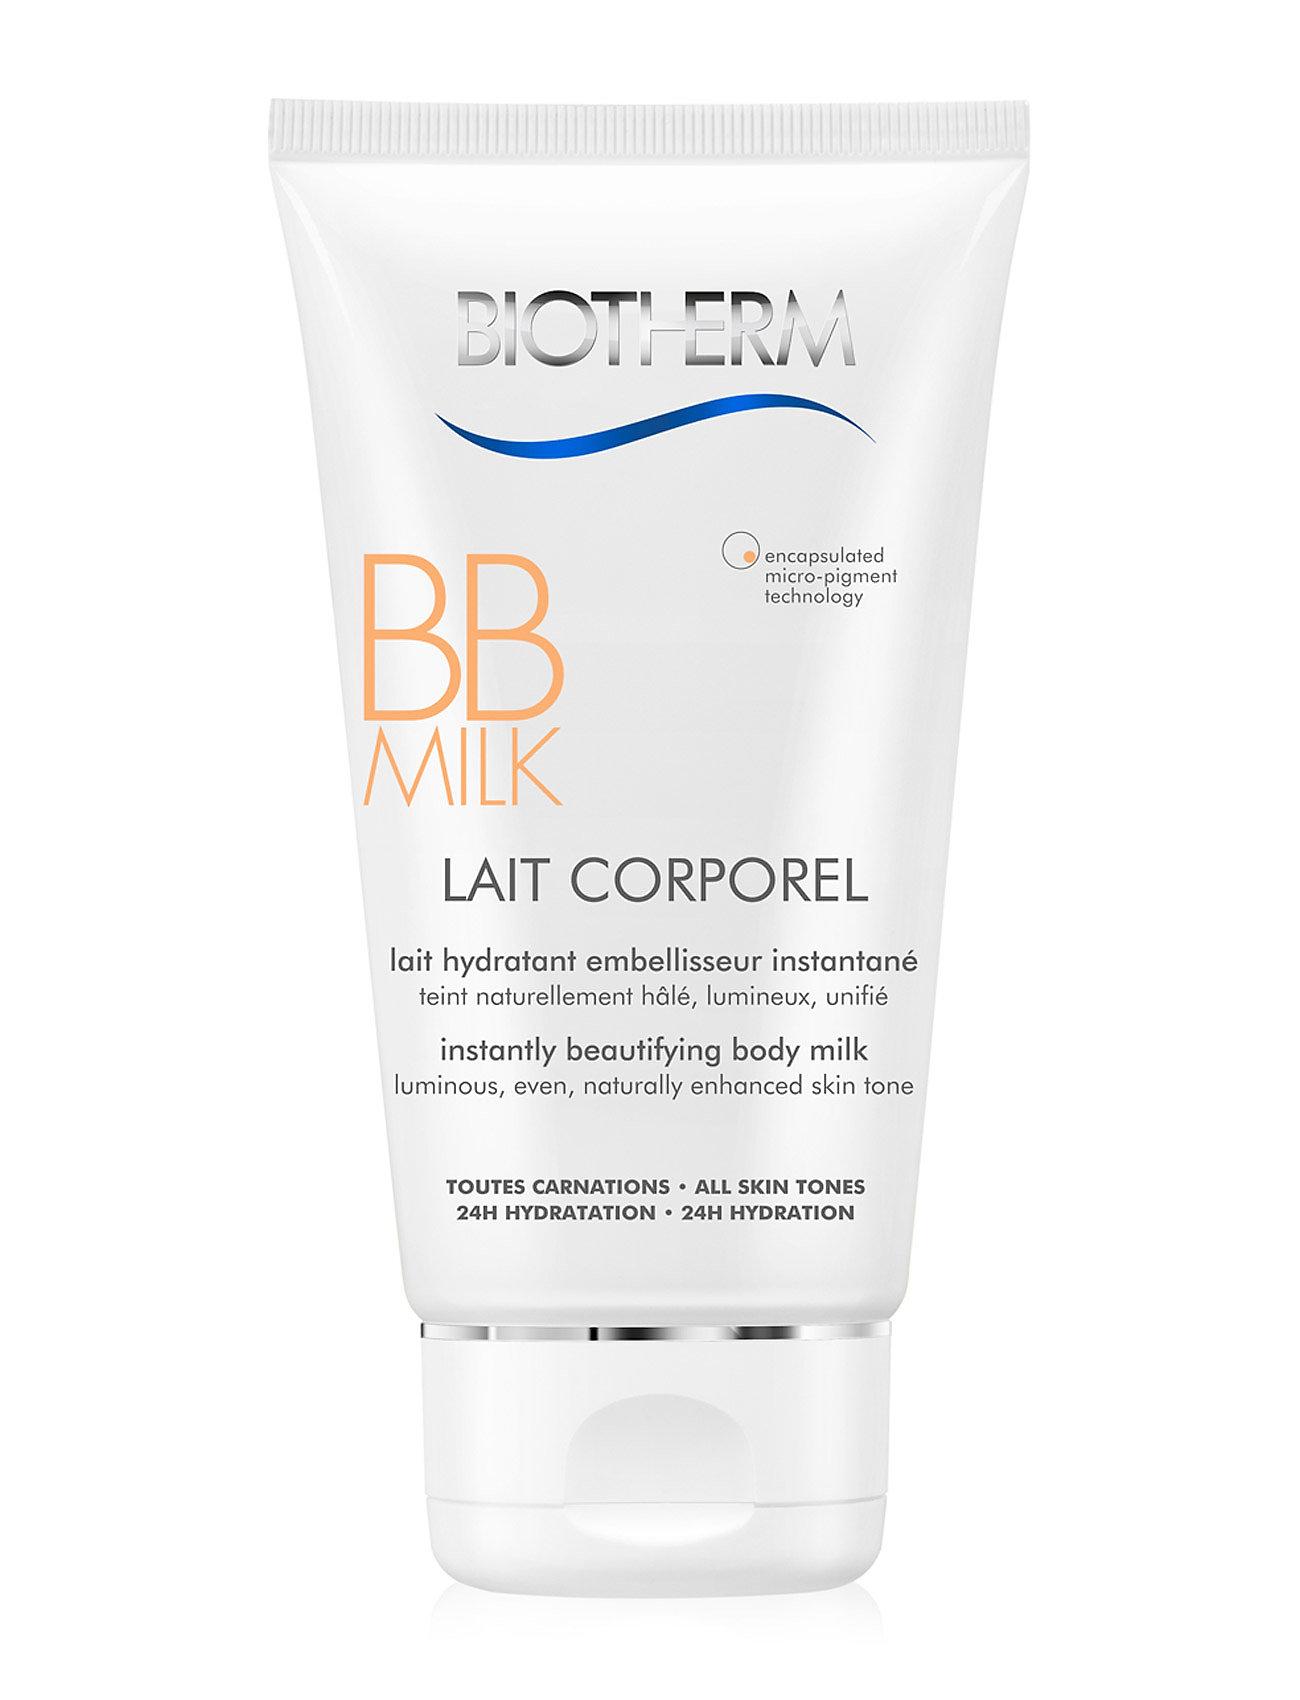 biotherm – Lait corporel bb body 150 ml på boozt.com dk